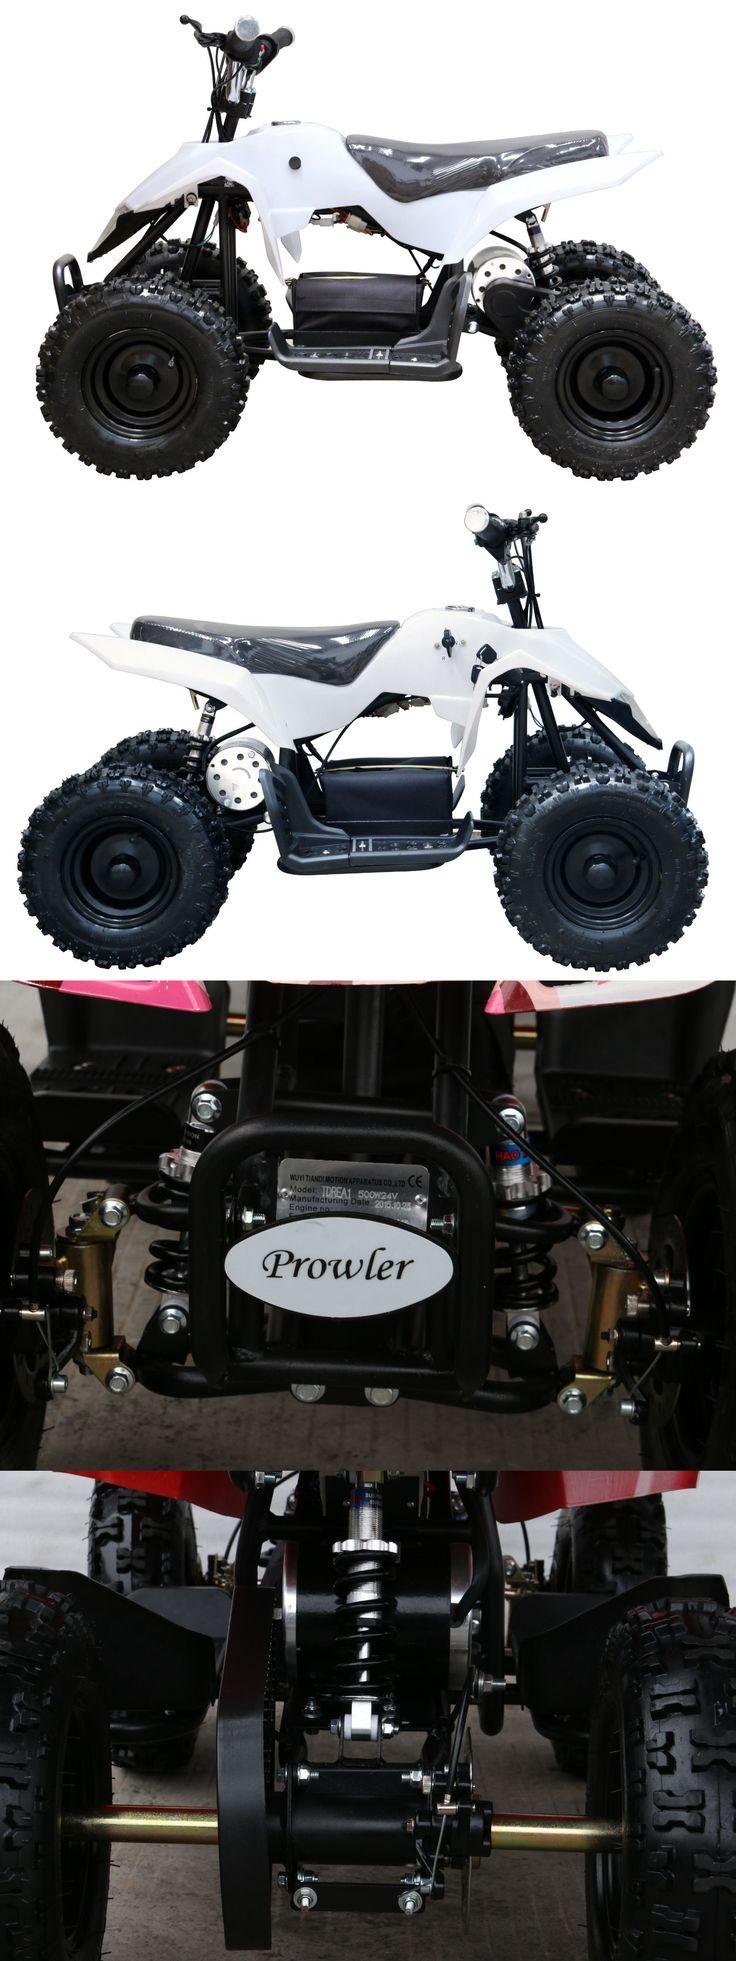 Complete Go-Karts and Frames 64656: 500W Electric Atv Quad Bike Kids 4 Wheeler Dirt Buggy Pocket Bike BUY IT NOW ONLY: $535.99